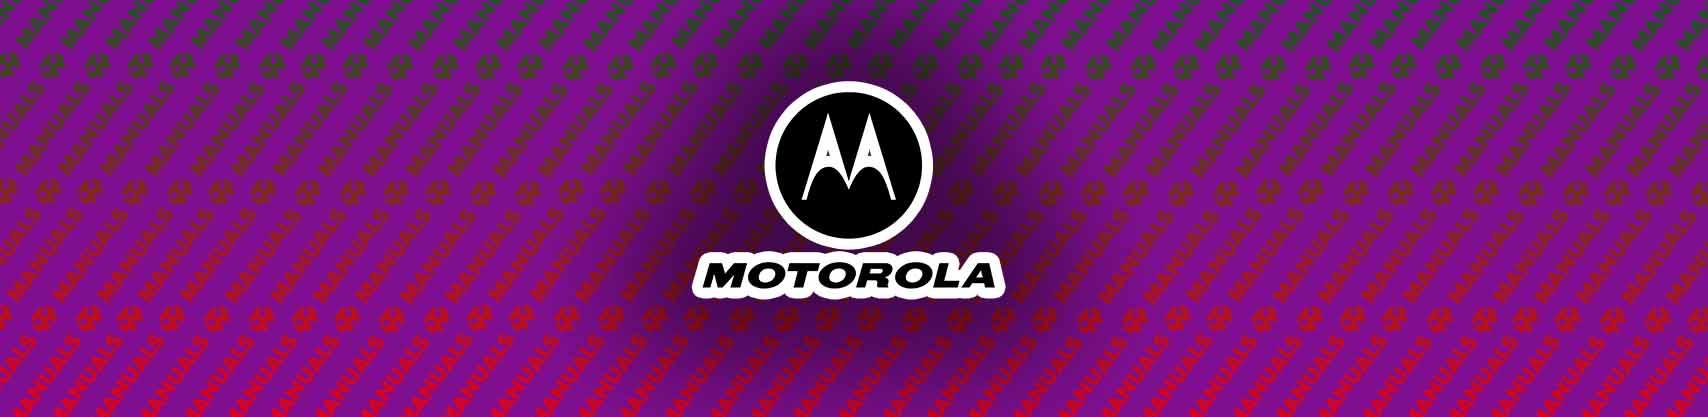 Motorola Moto G4 Manual